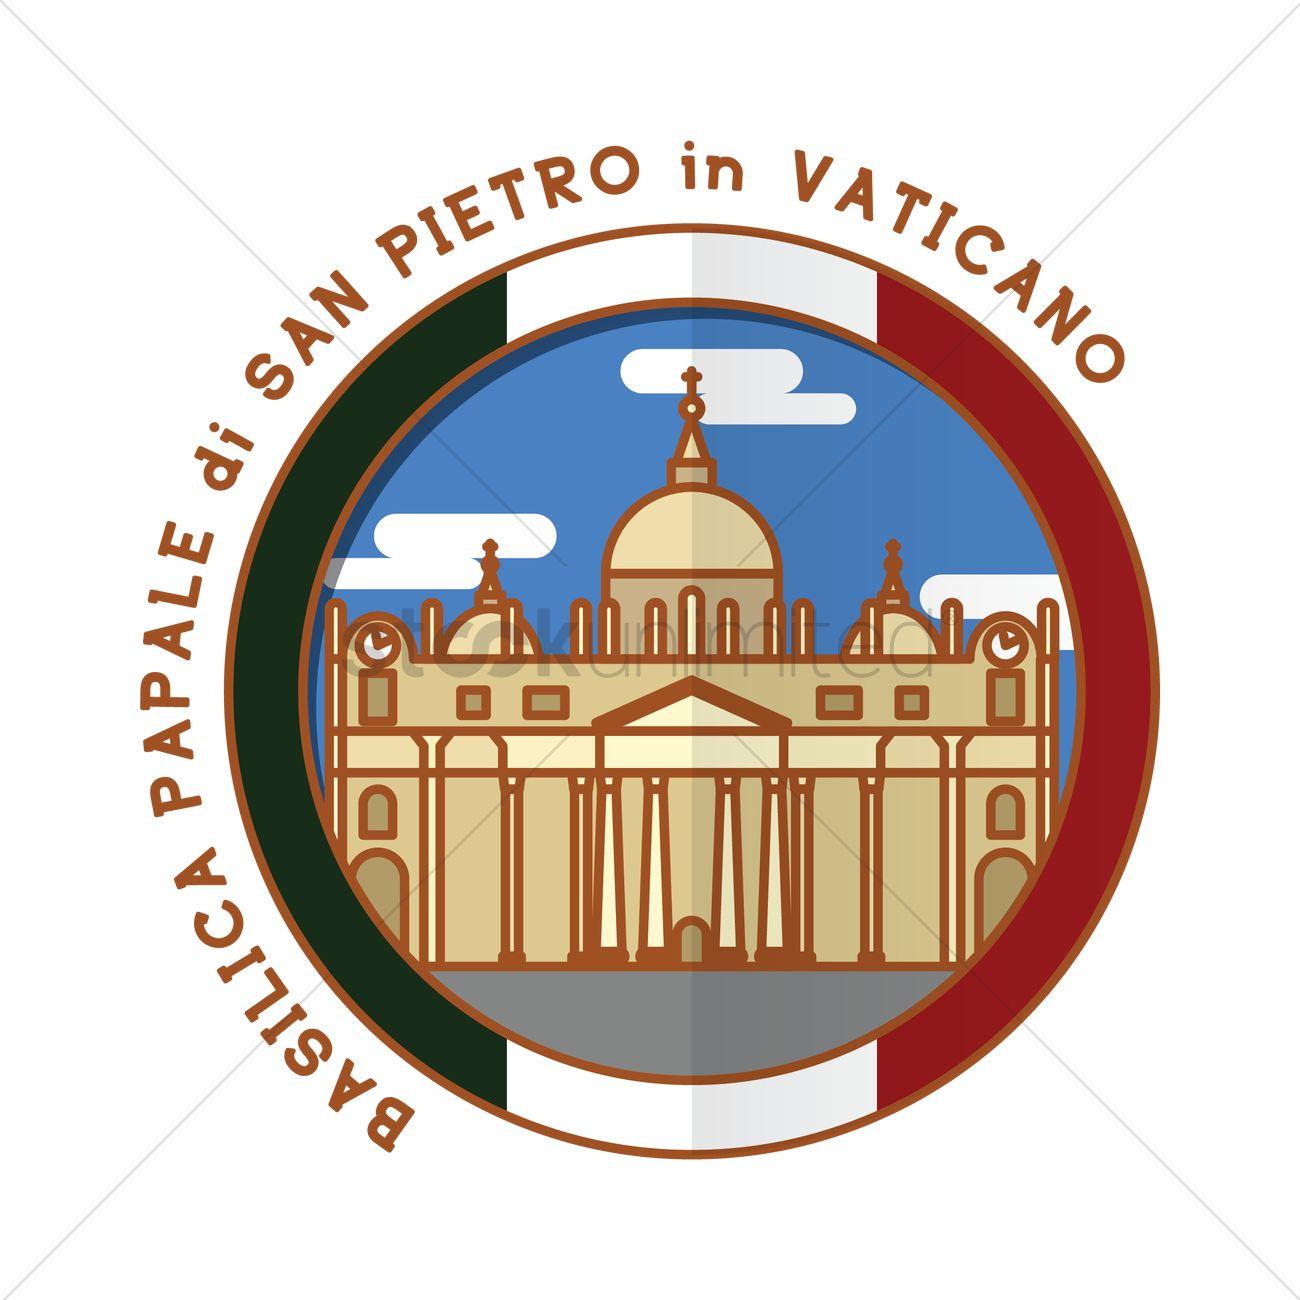 Basilica papale di san pietro in vaticano Vector Image.